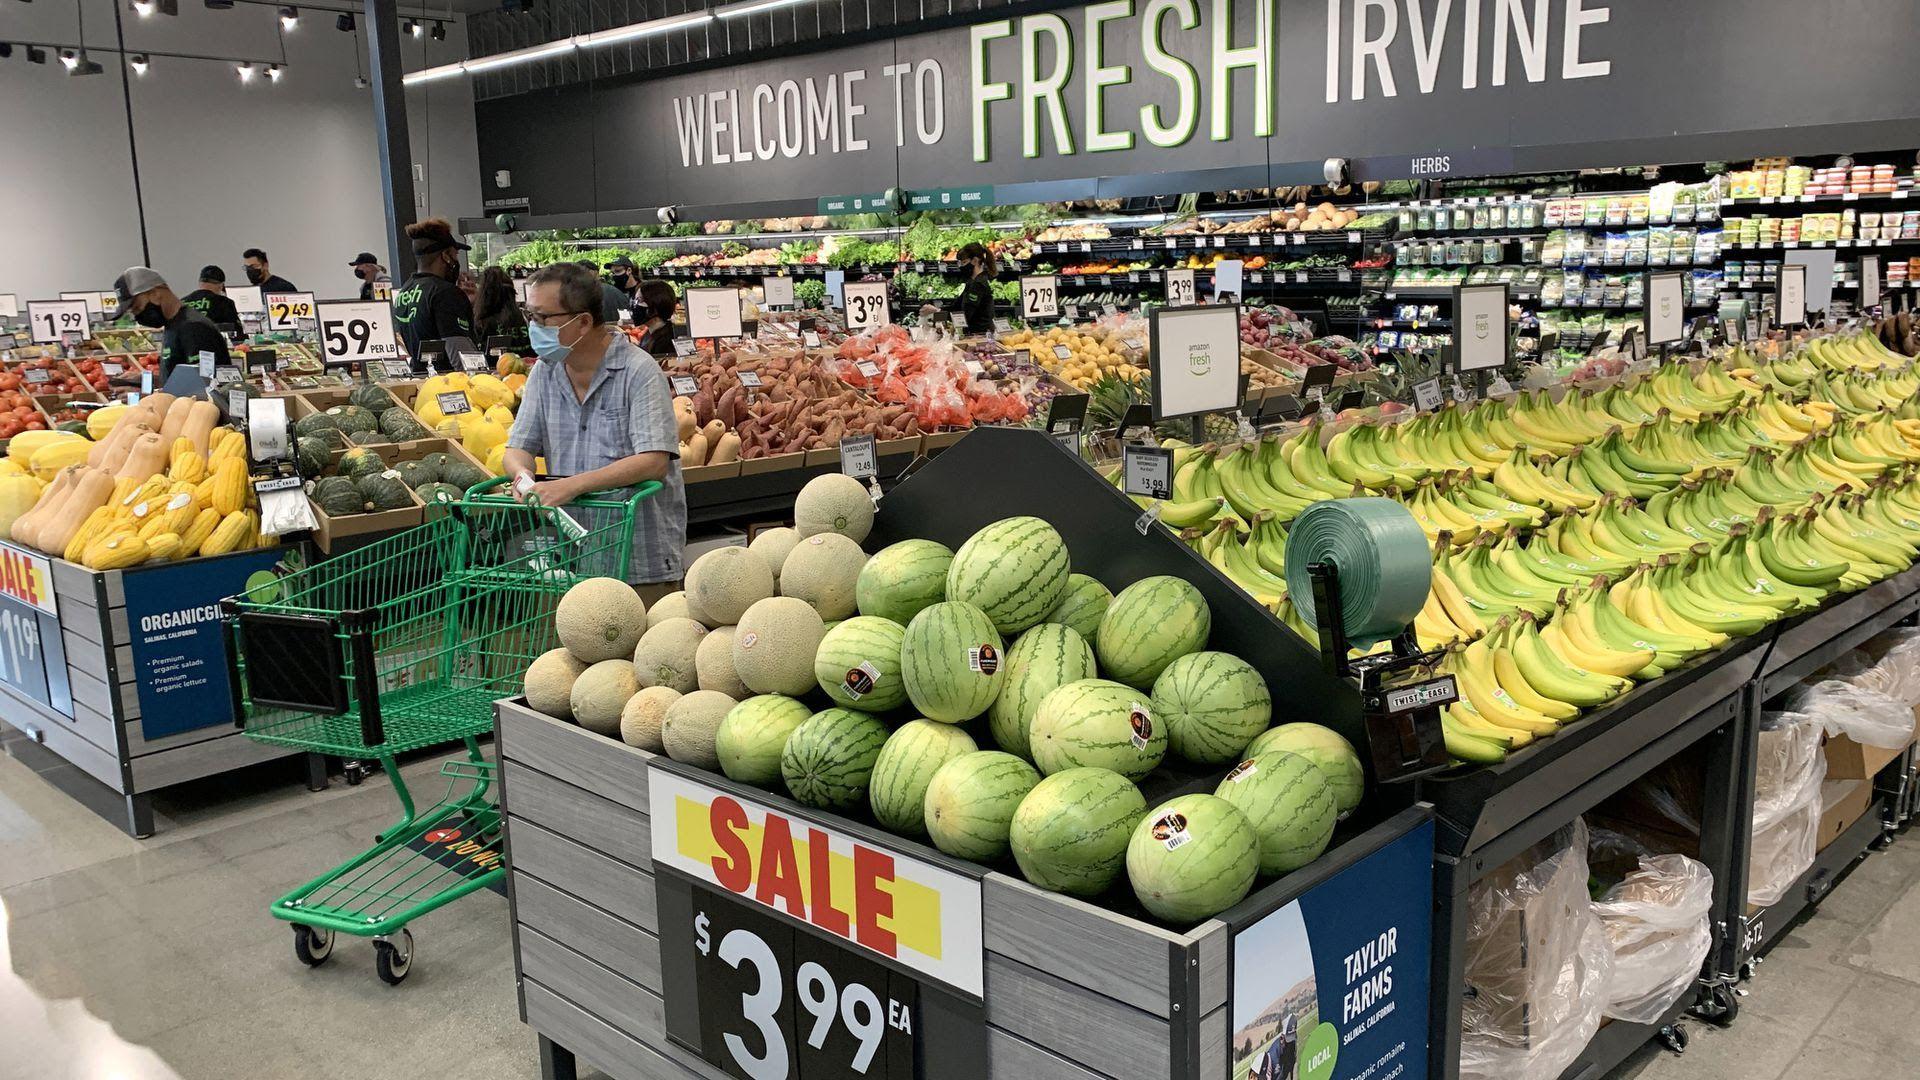 An Amazon Fresh store in Irvine, California.